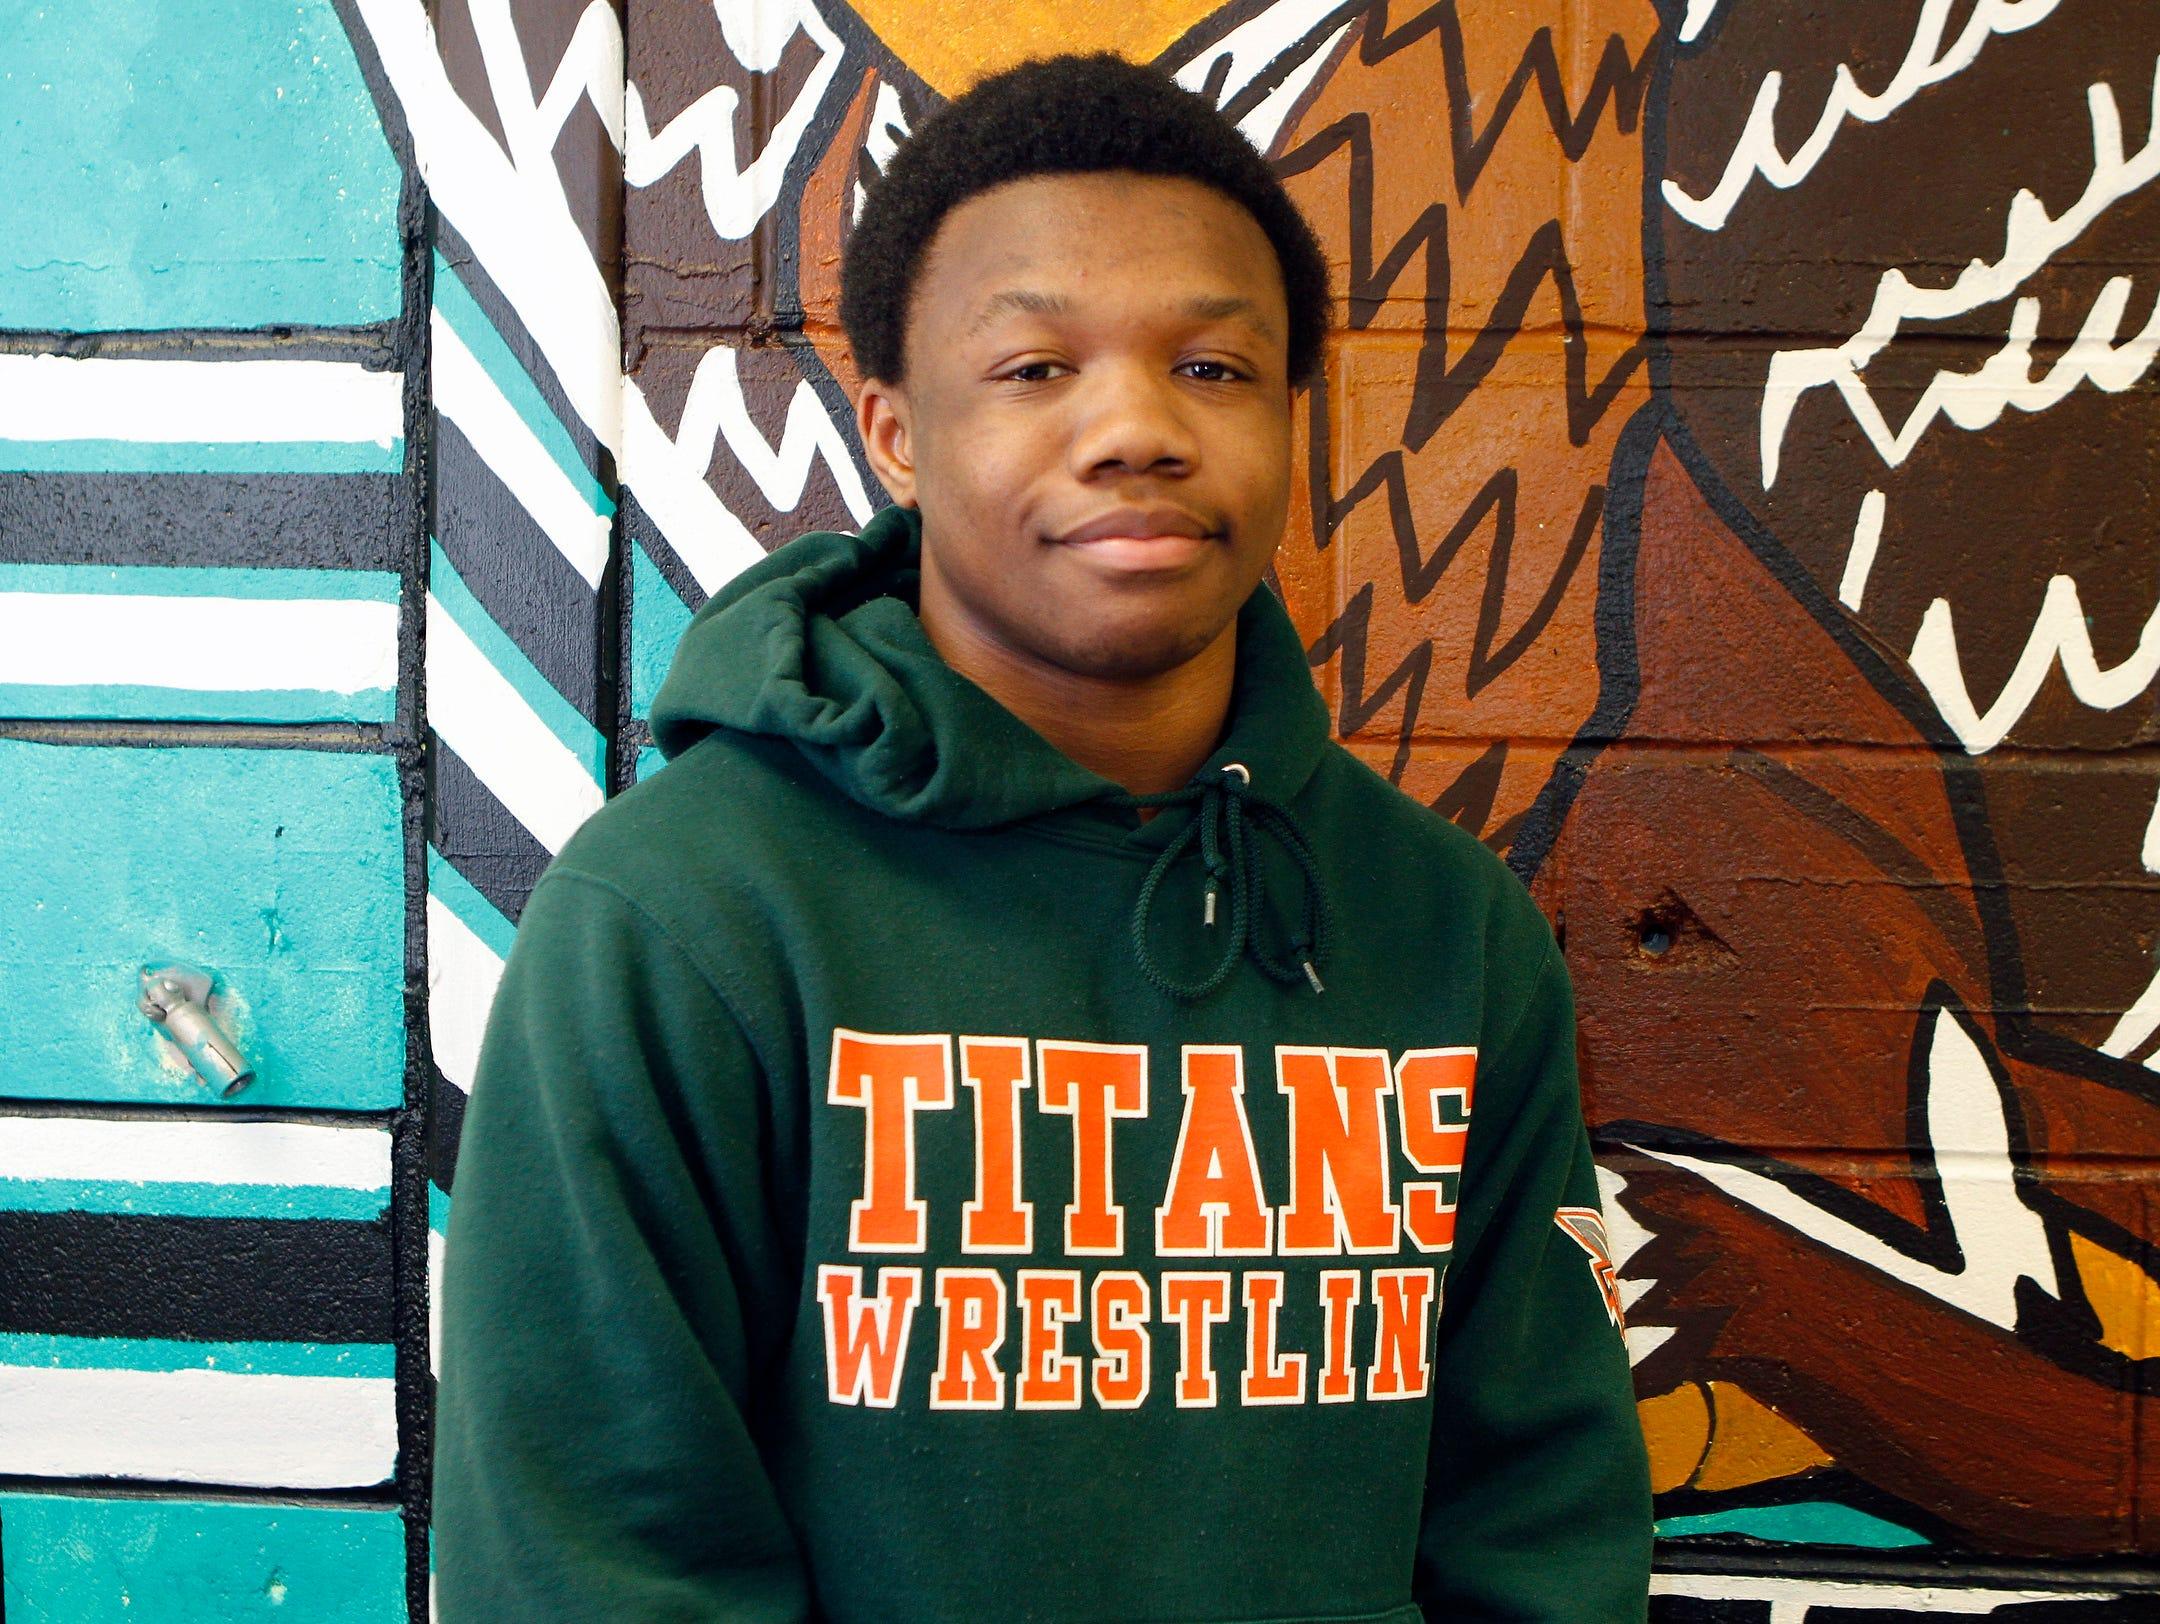 Ramapo High School's Trey Wardlaw, 2016 Rockland County Wrestler of the Year. Tuesday, March 29, 2016.